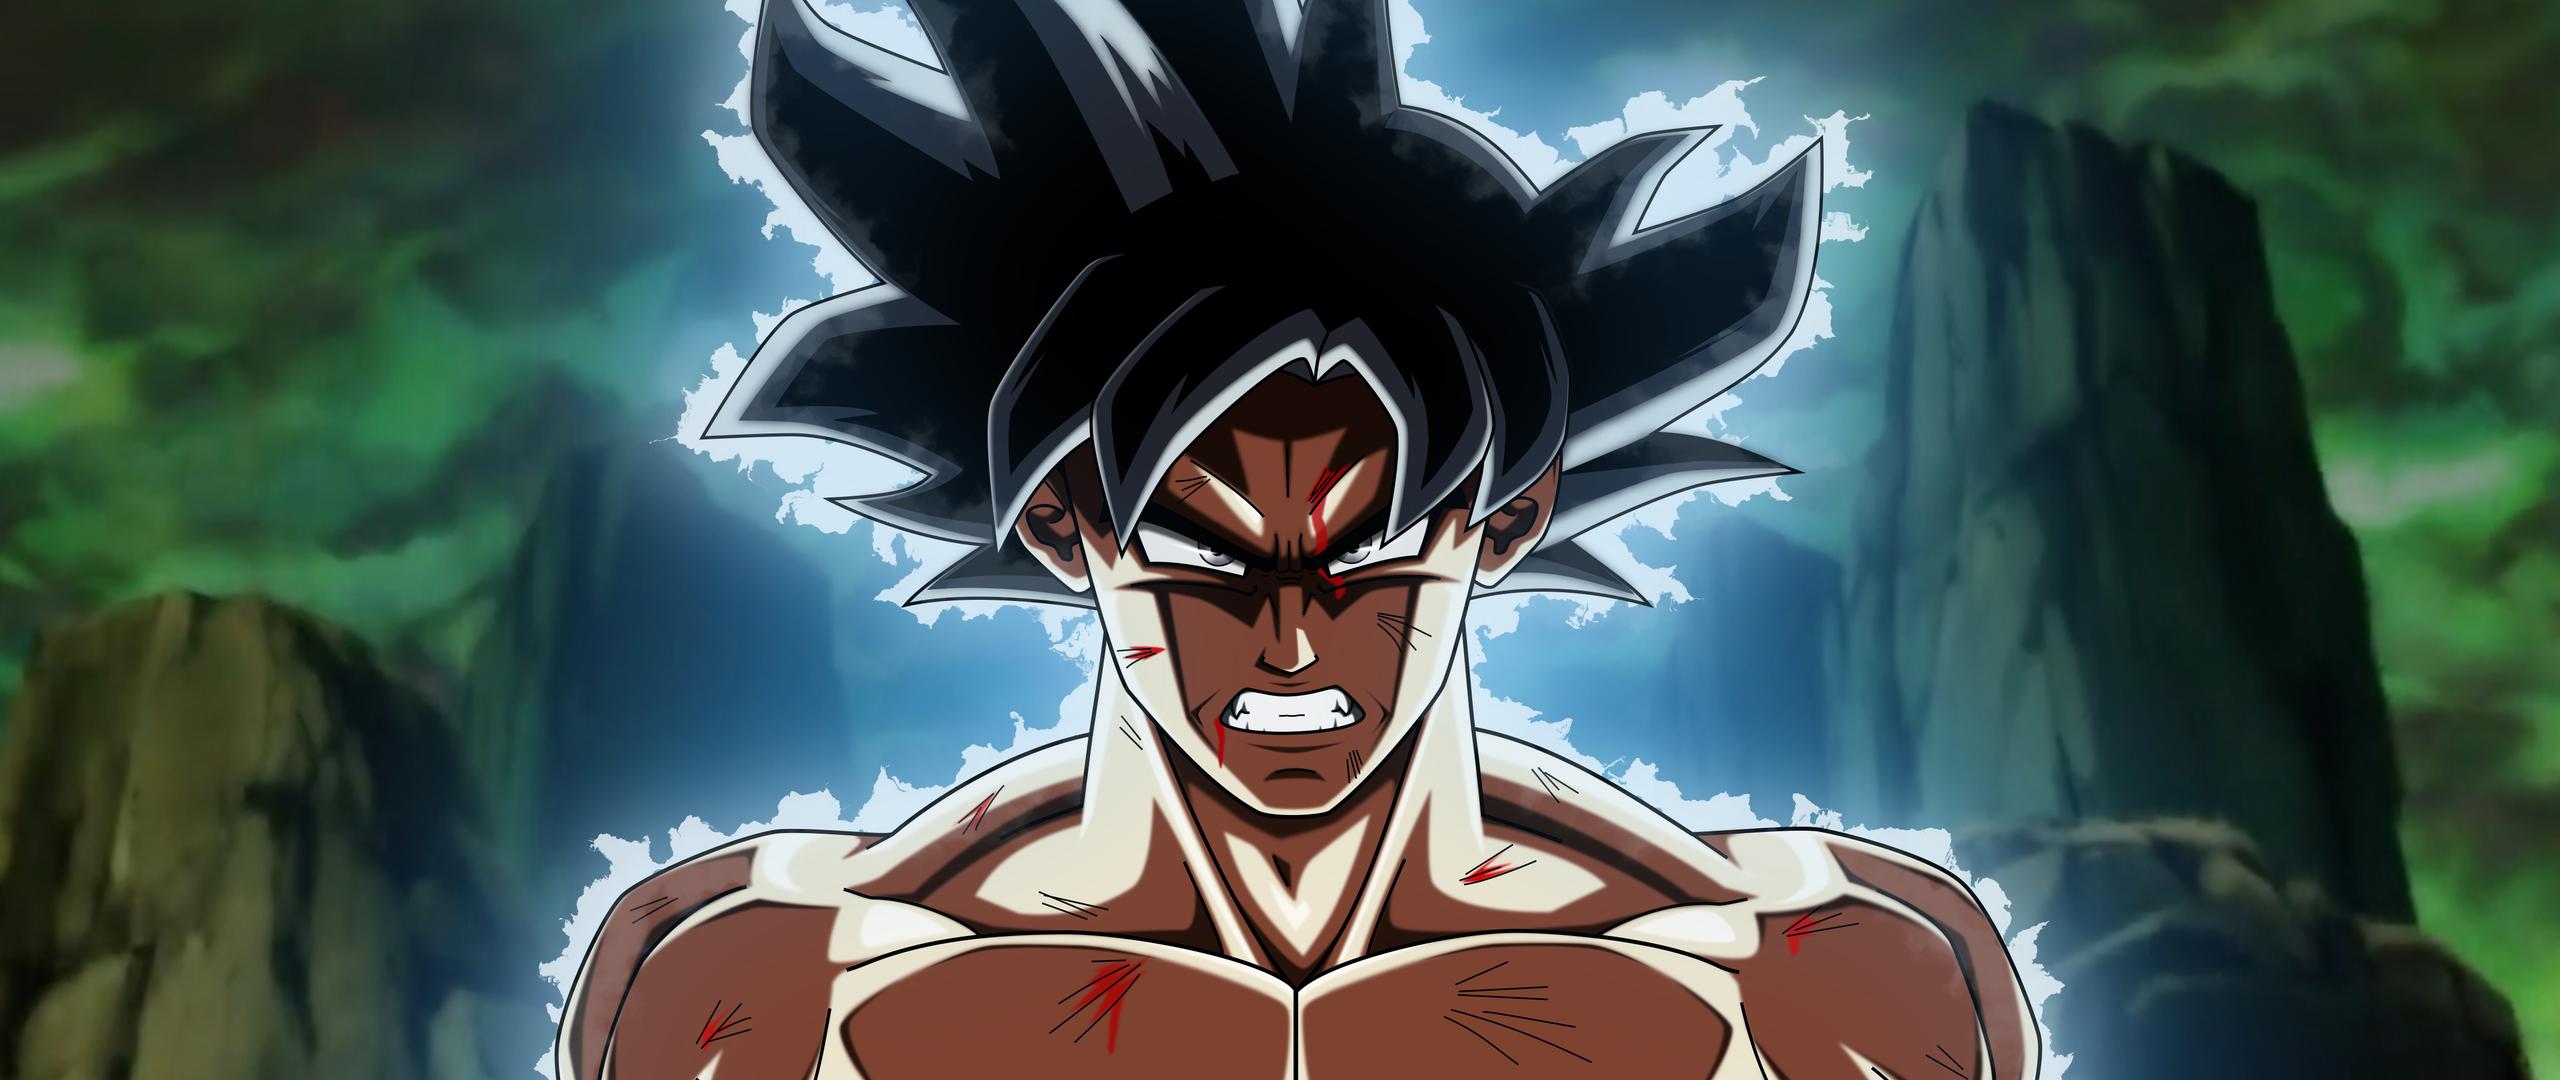 Goku Ultra Instinct 4k Wallpapers: 2560x1080 Dragon Ball Super Goku Ultra Instinct 2560x1080